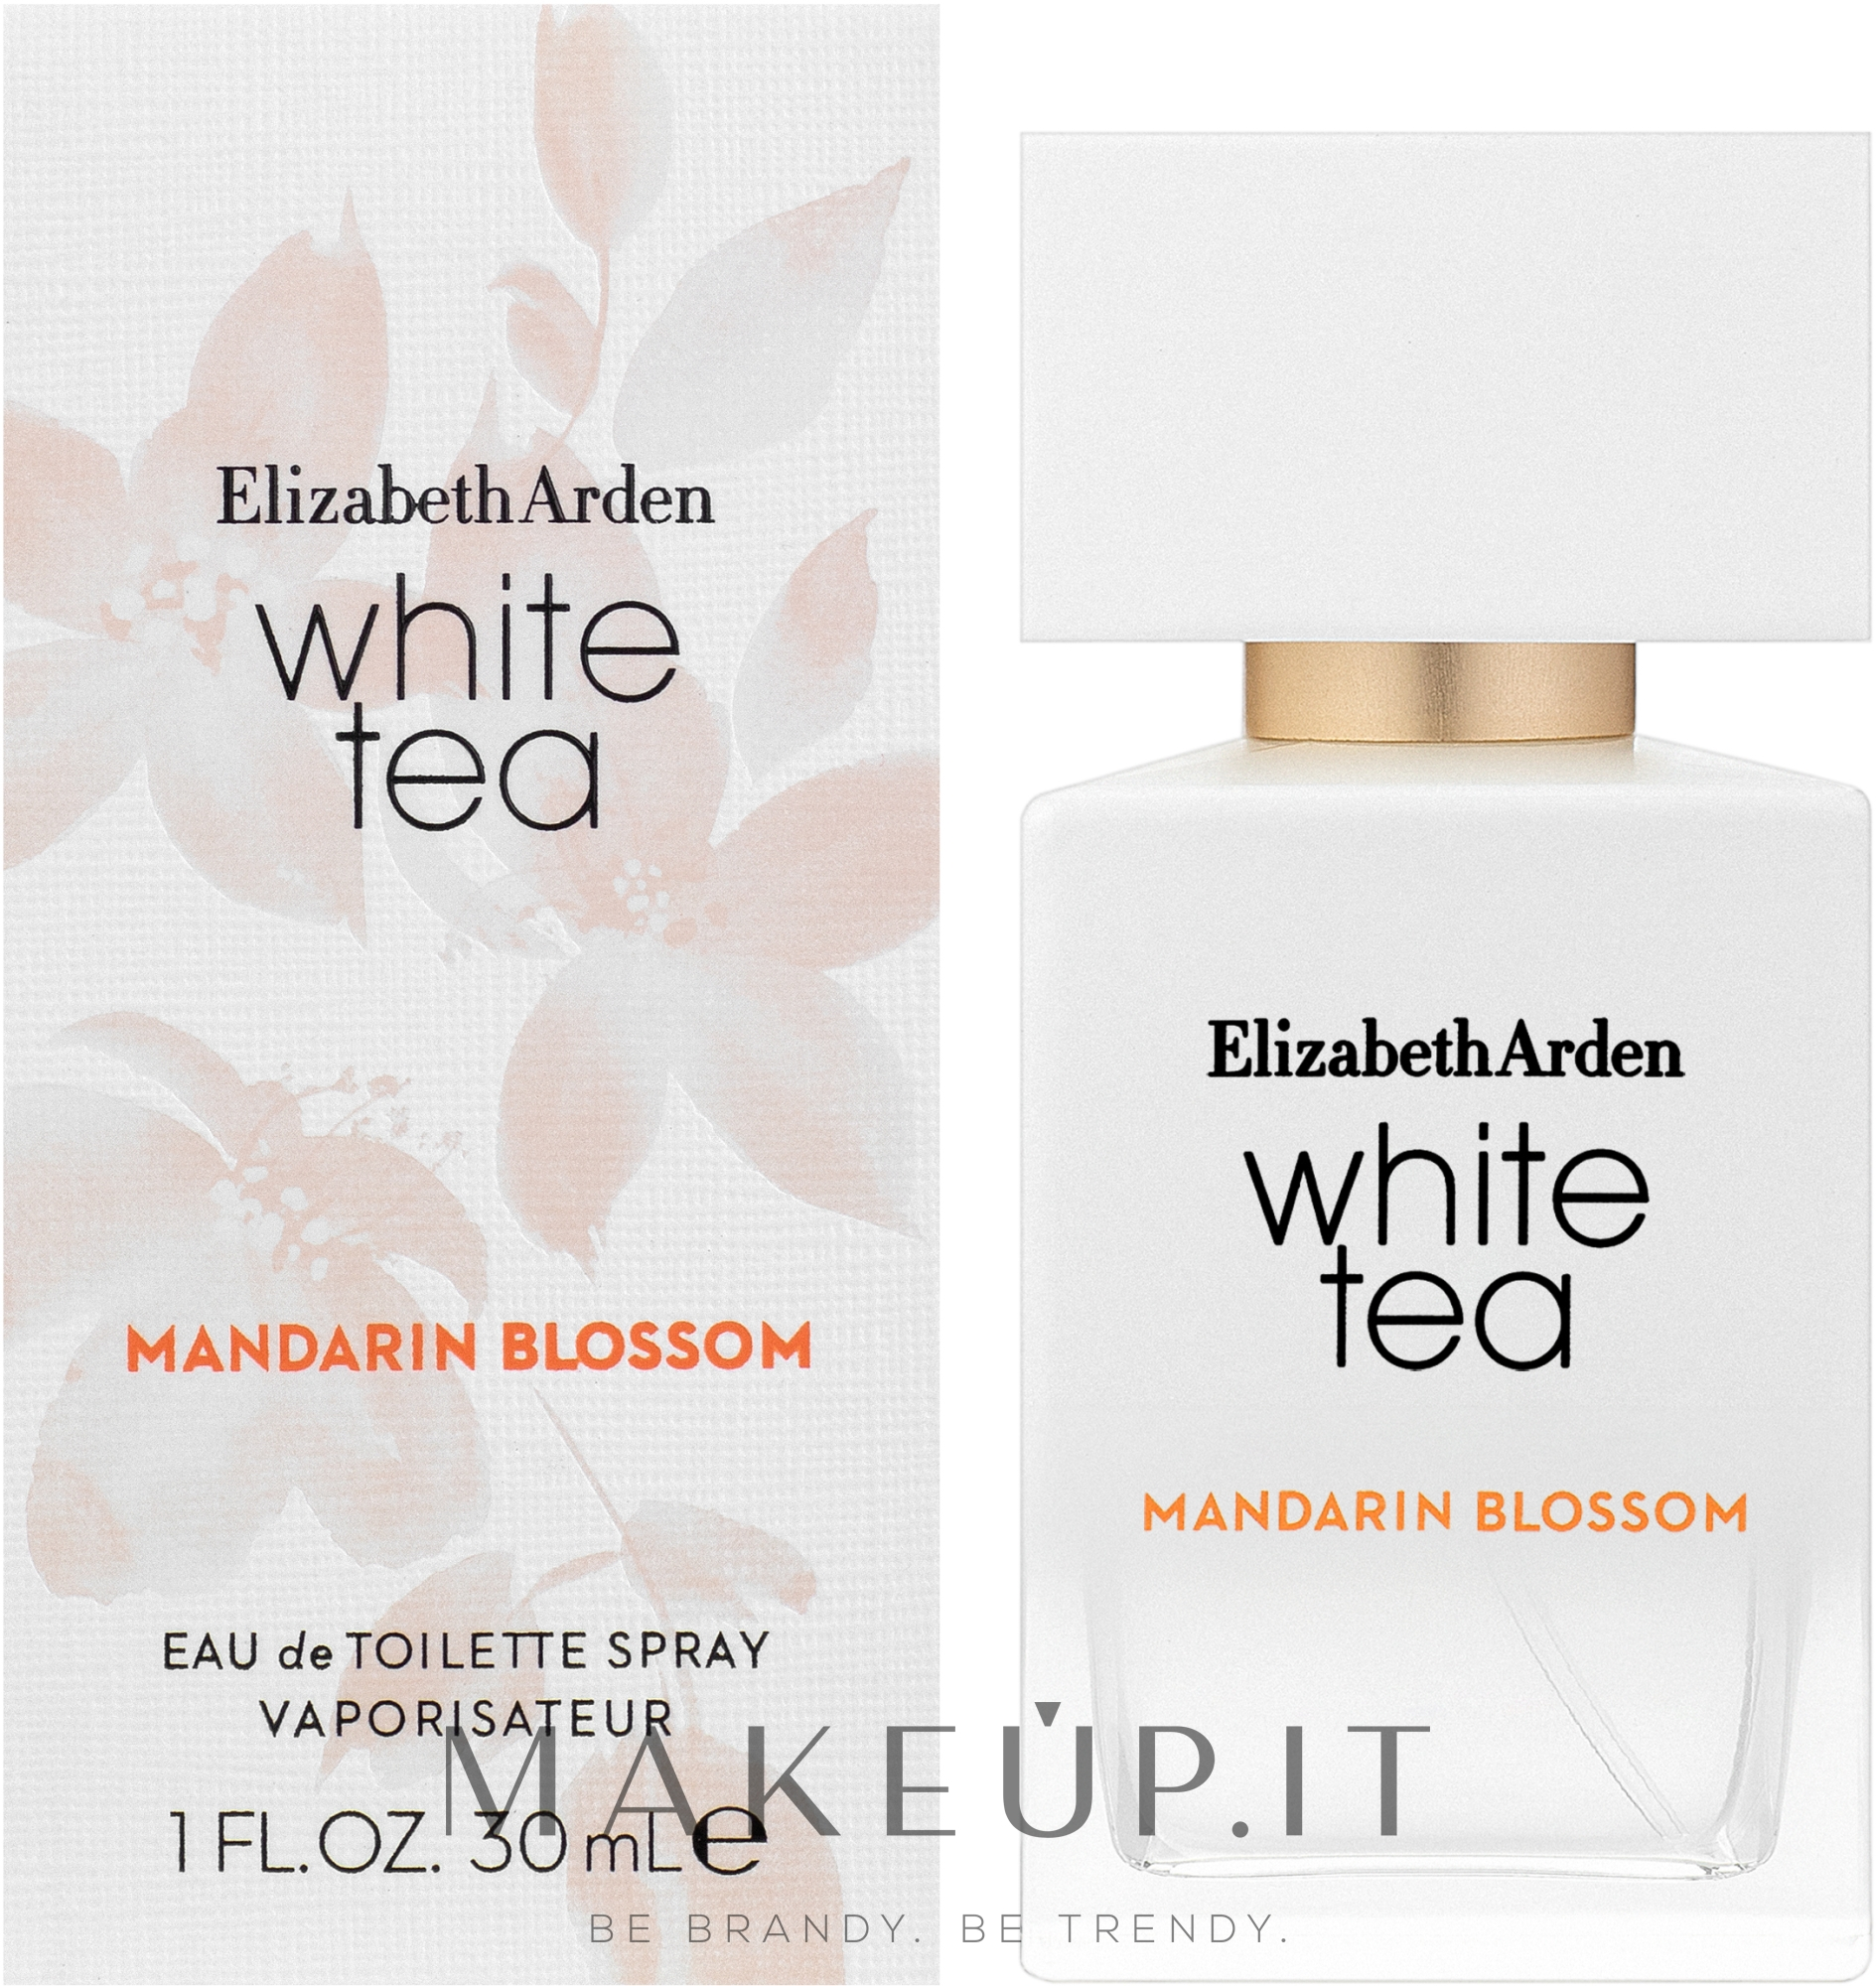 Elizabeth Arden White Tea Mandarin Blossom - Eau de toilette — foto 30 ml